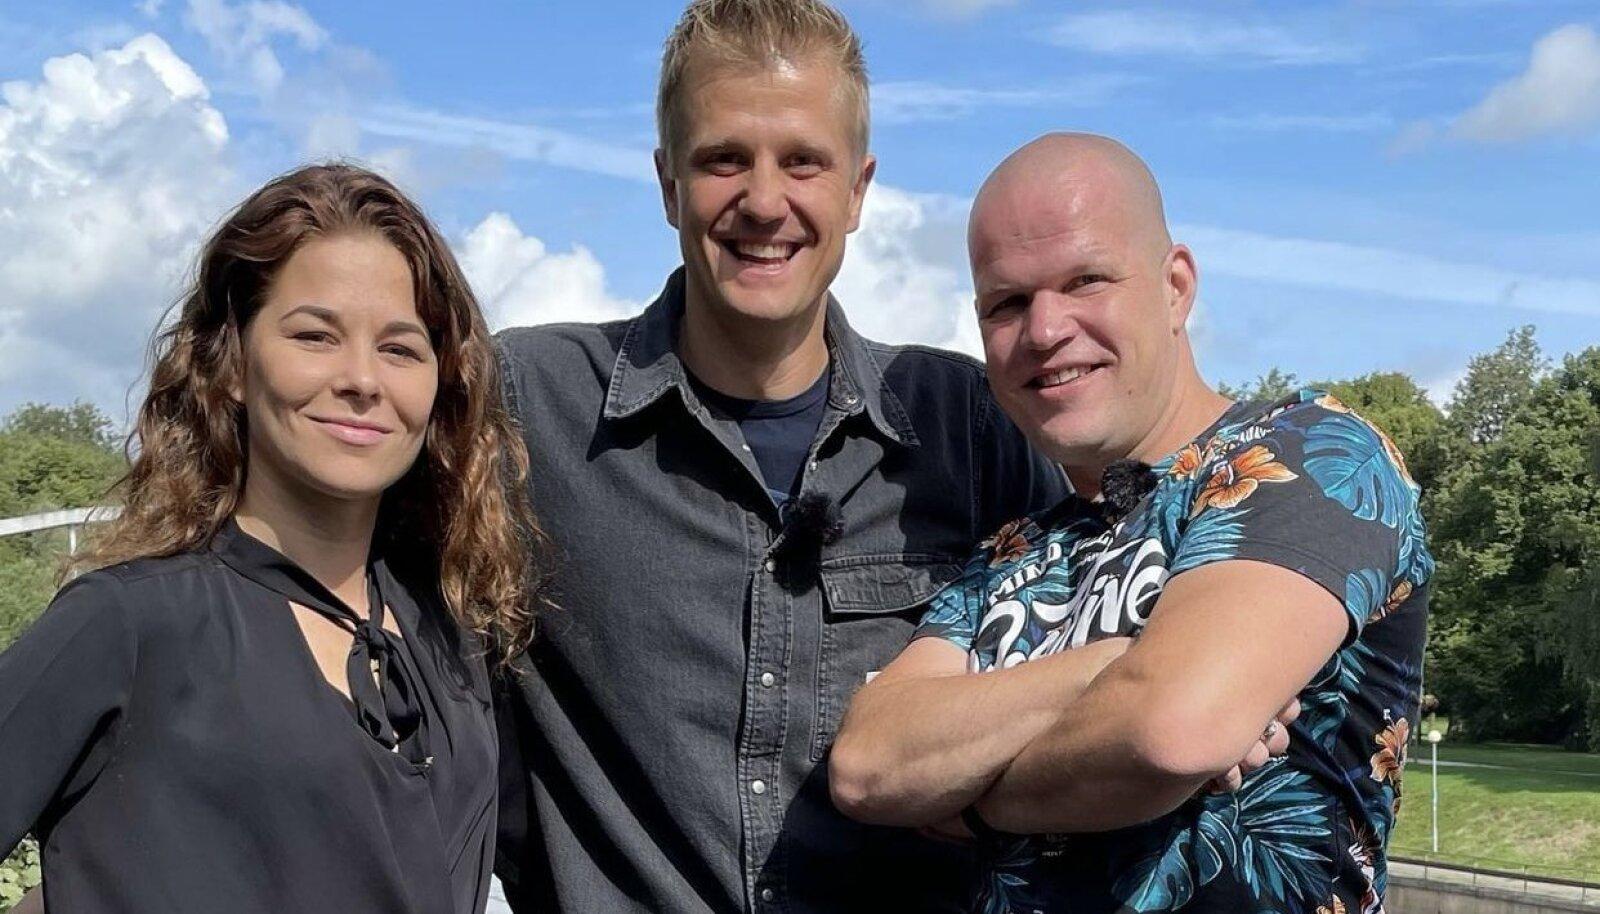 Kati Rannamees, Joel Ostrat, Anterro Ahonen